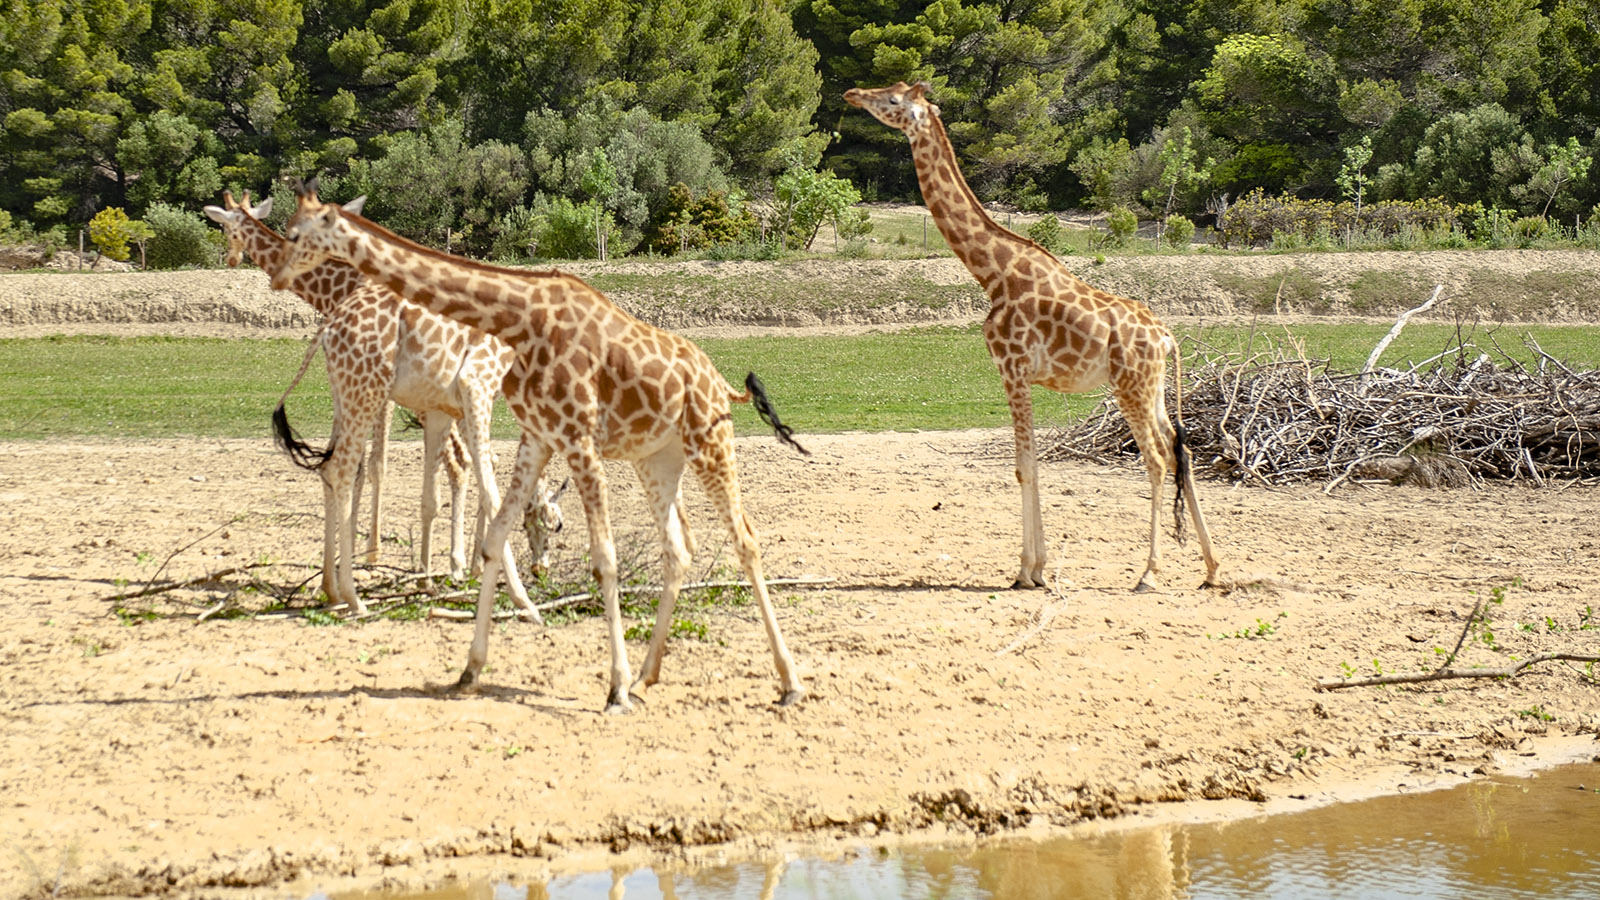 Safaripark Sigean: . Foto. Hilke Maunder